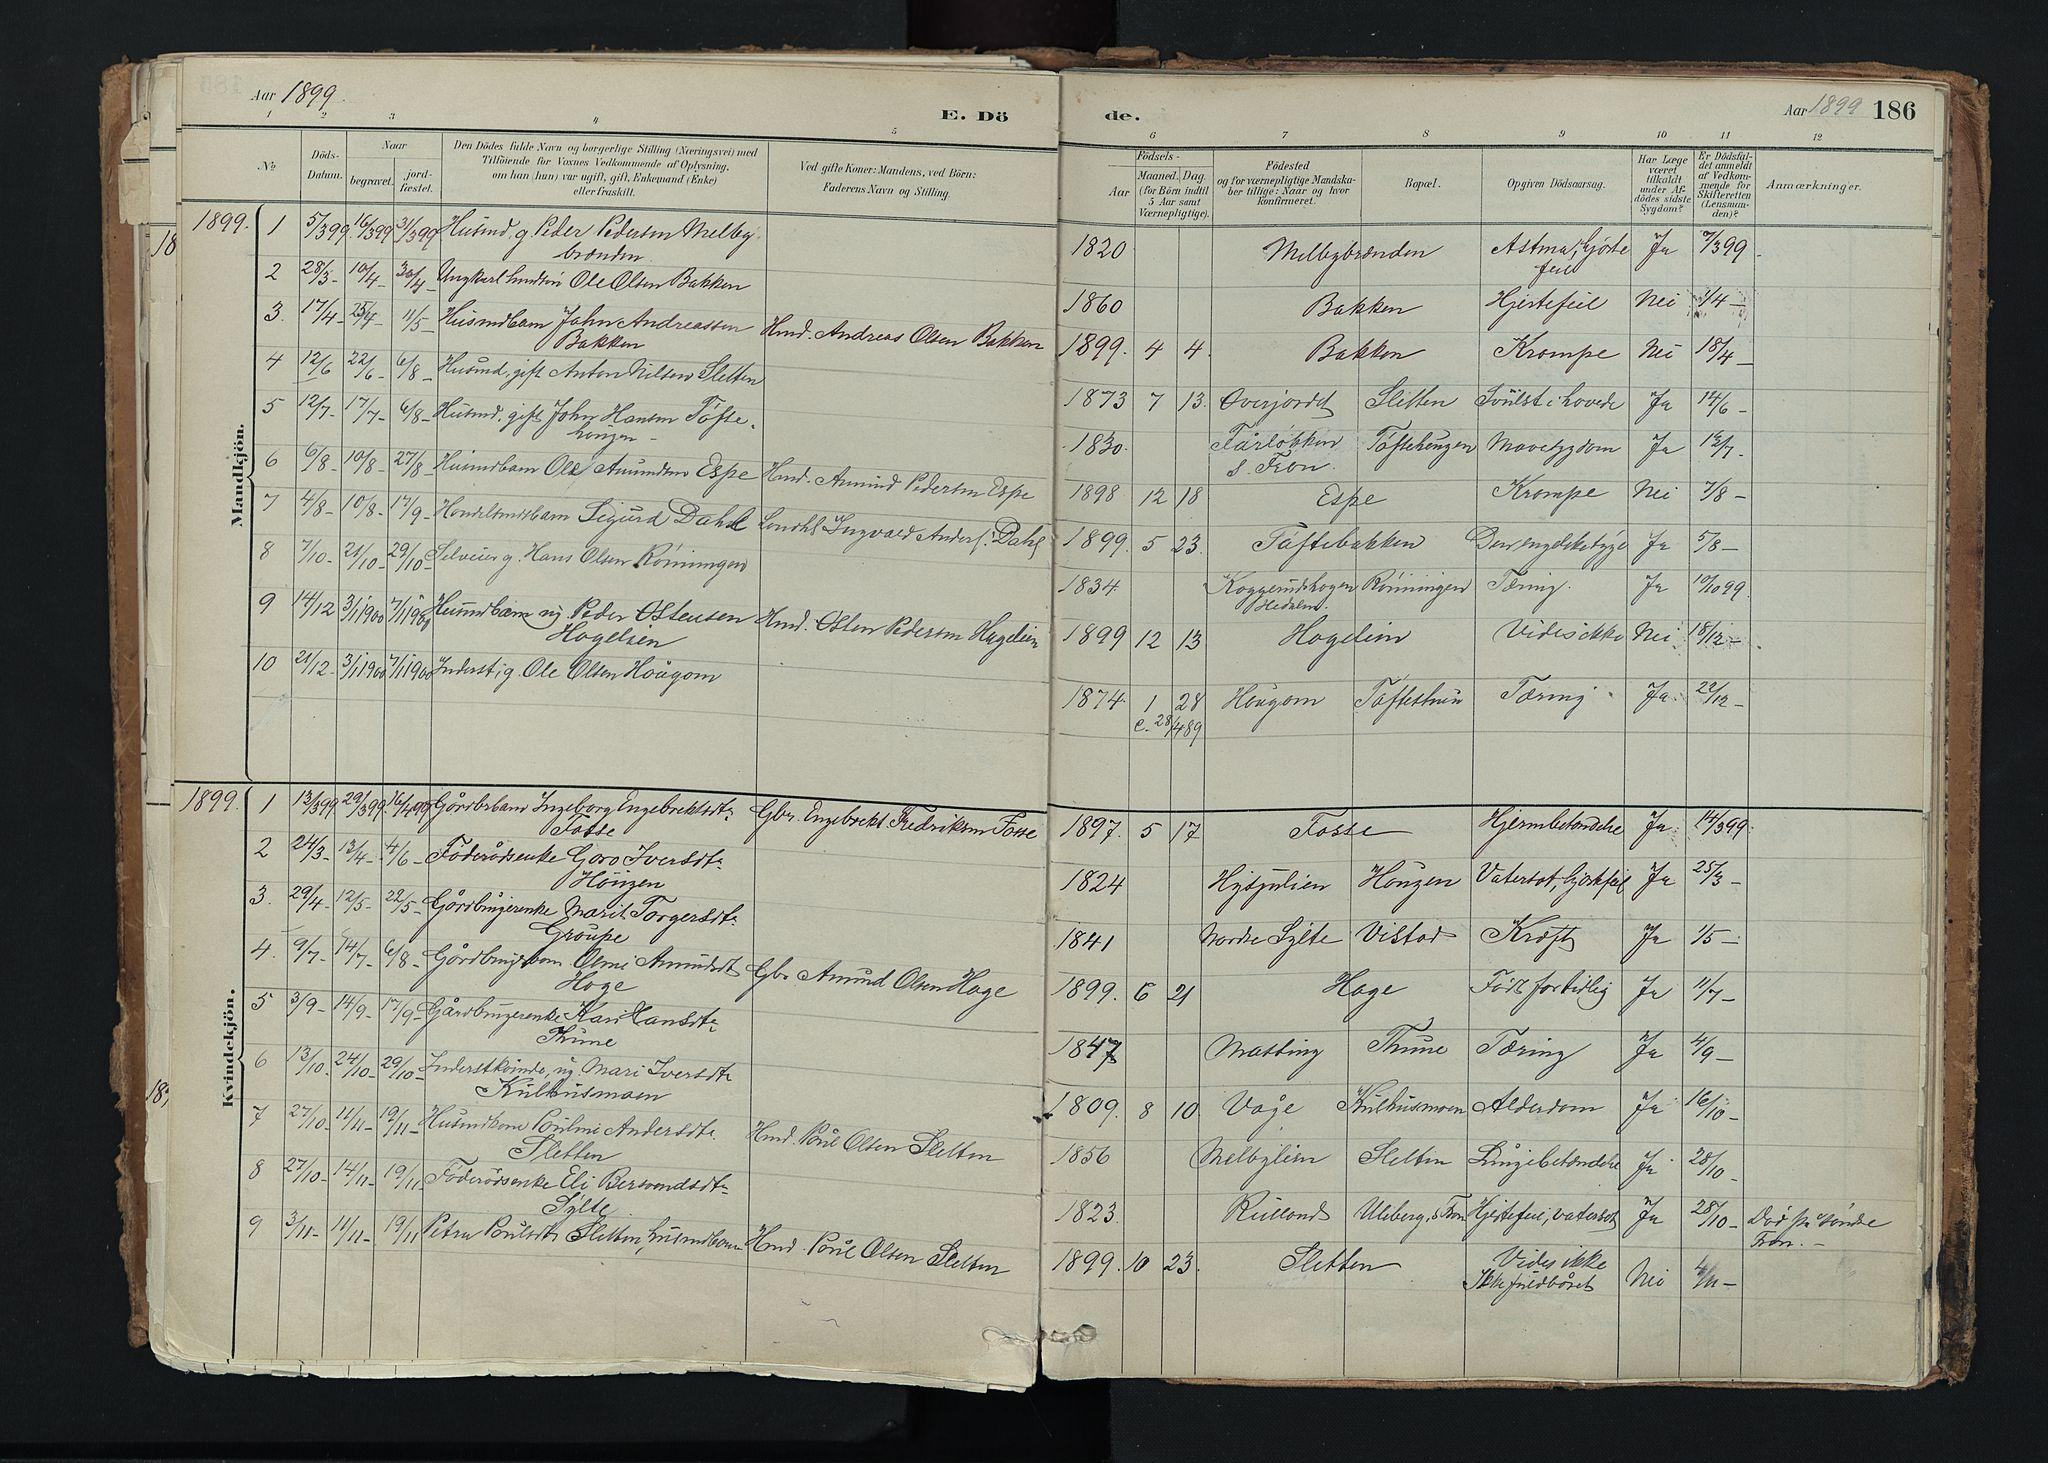 SAH, Nord-Fron prestekontor, Ministerialbok nr. 5, 1884-1914, s. 186